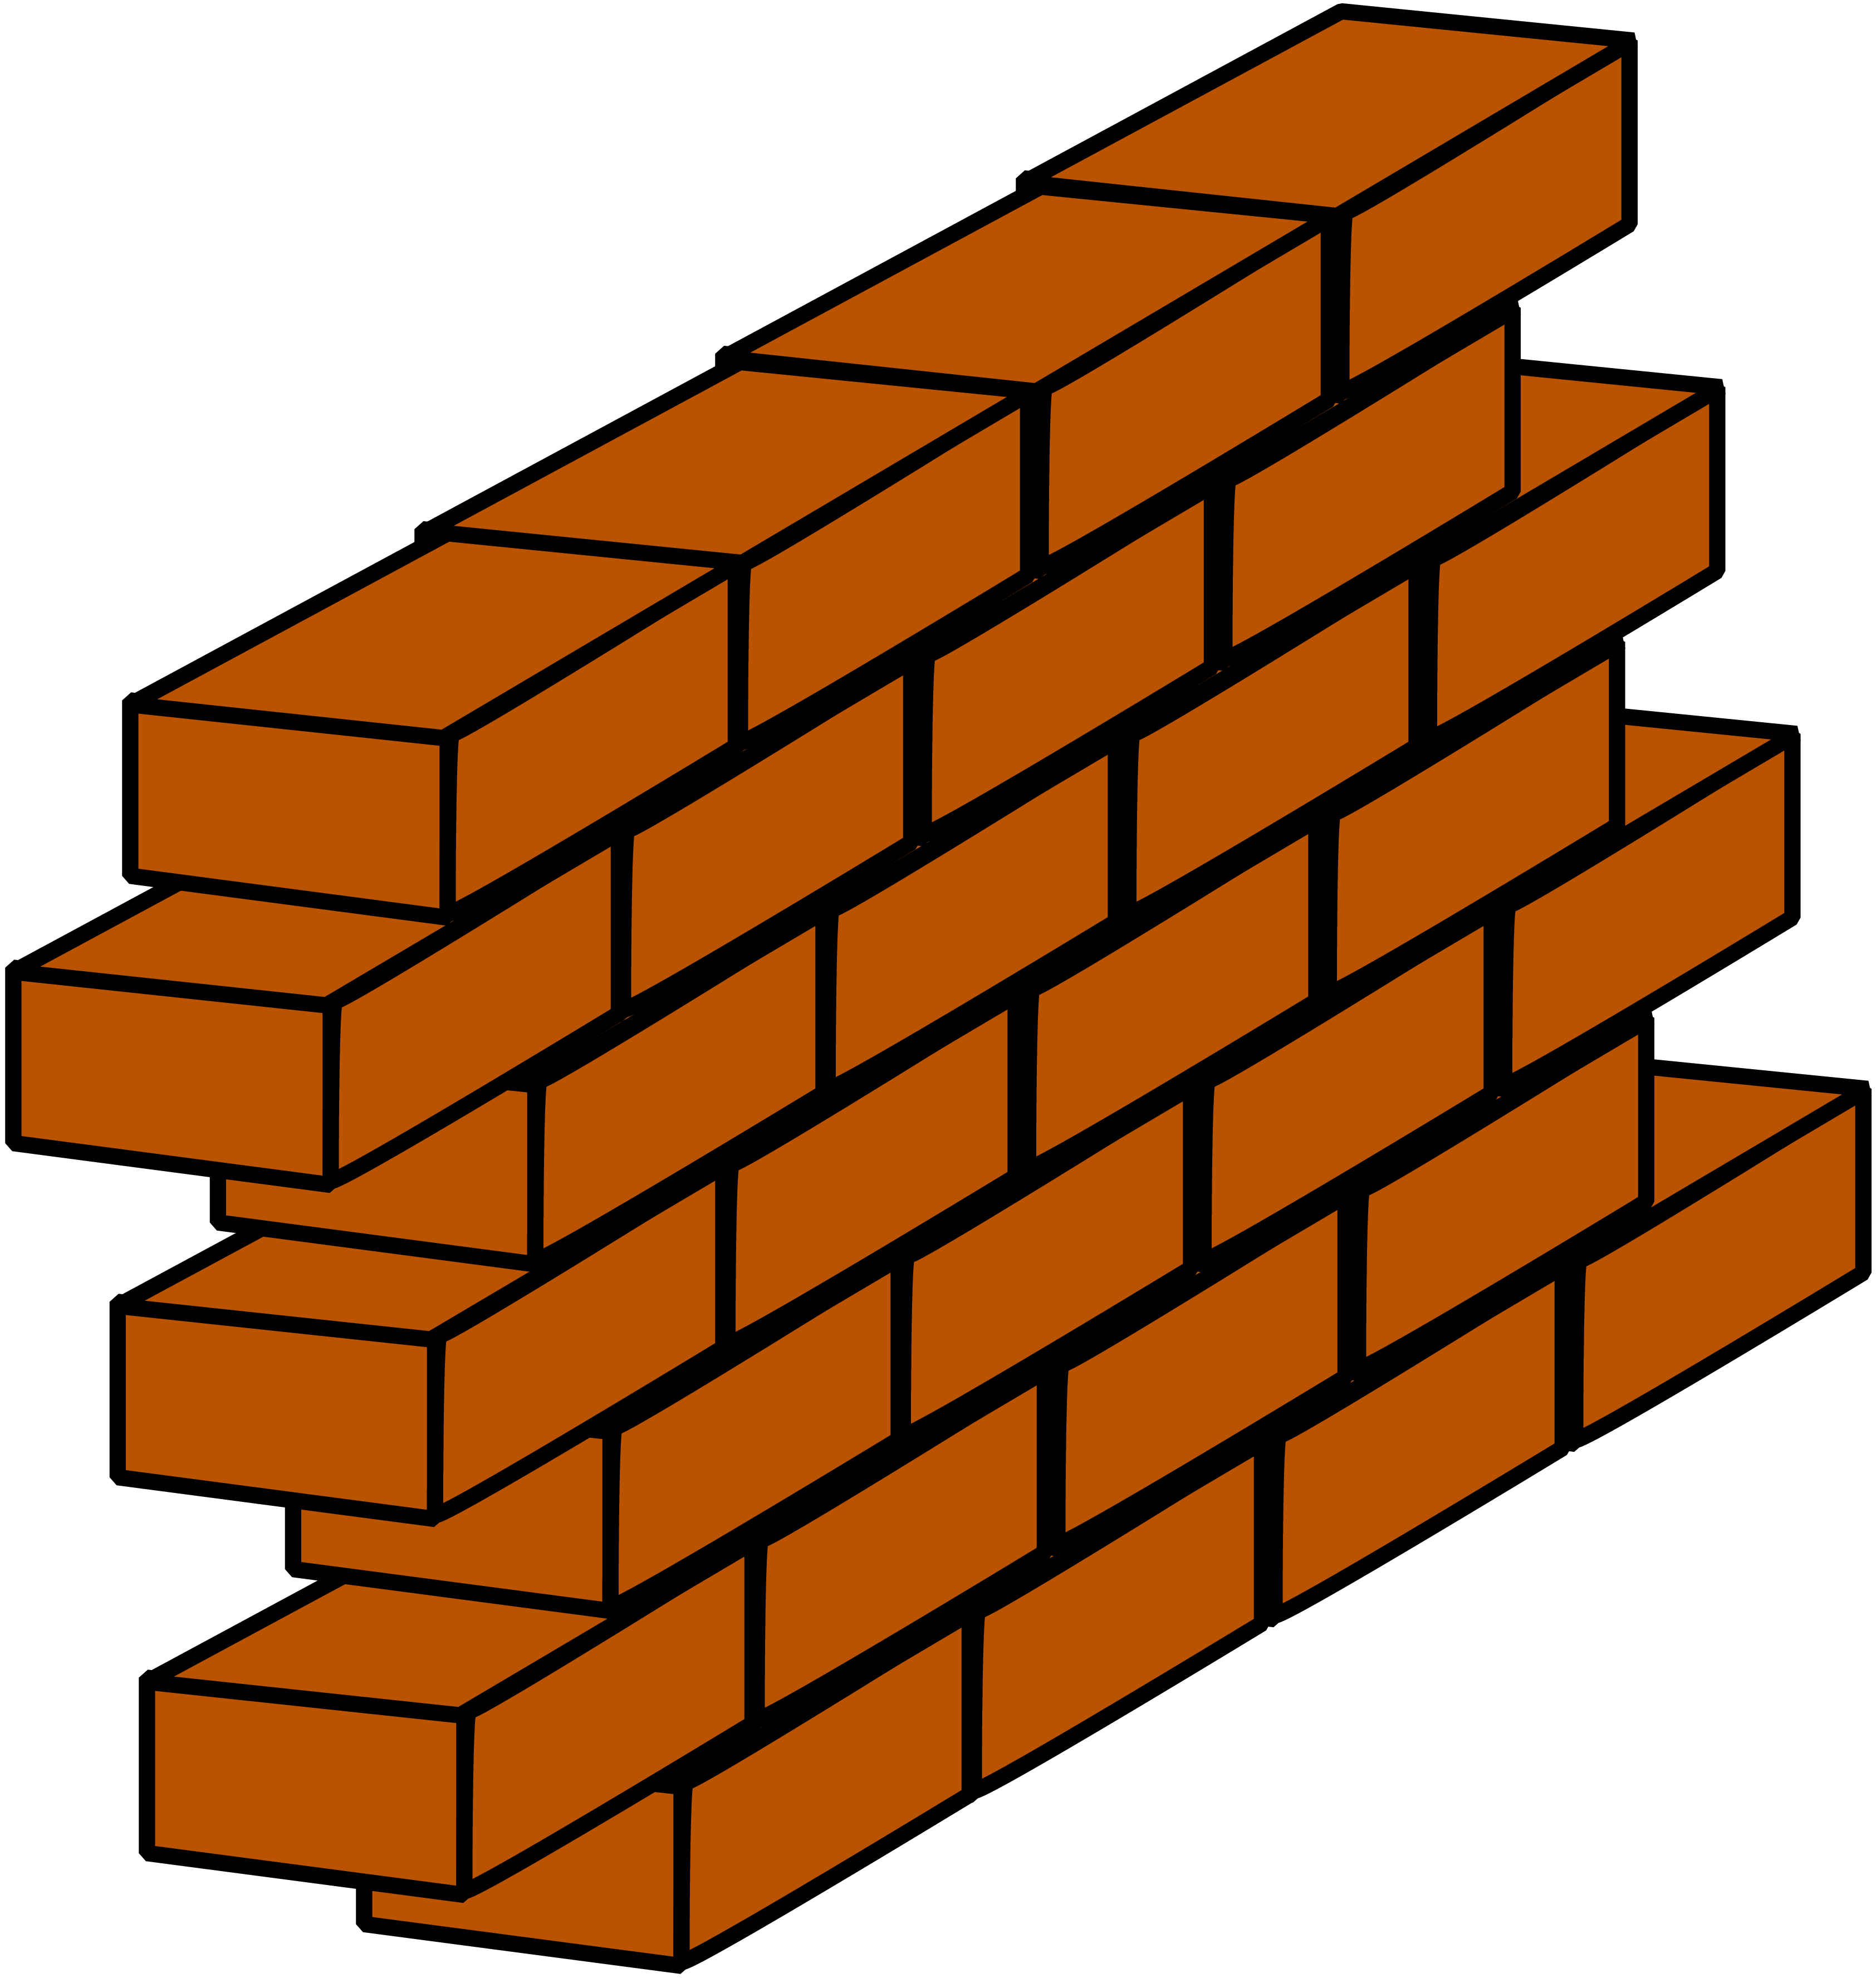 Wall clipart Brick%20clipart Clip Art Images Free